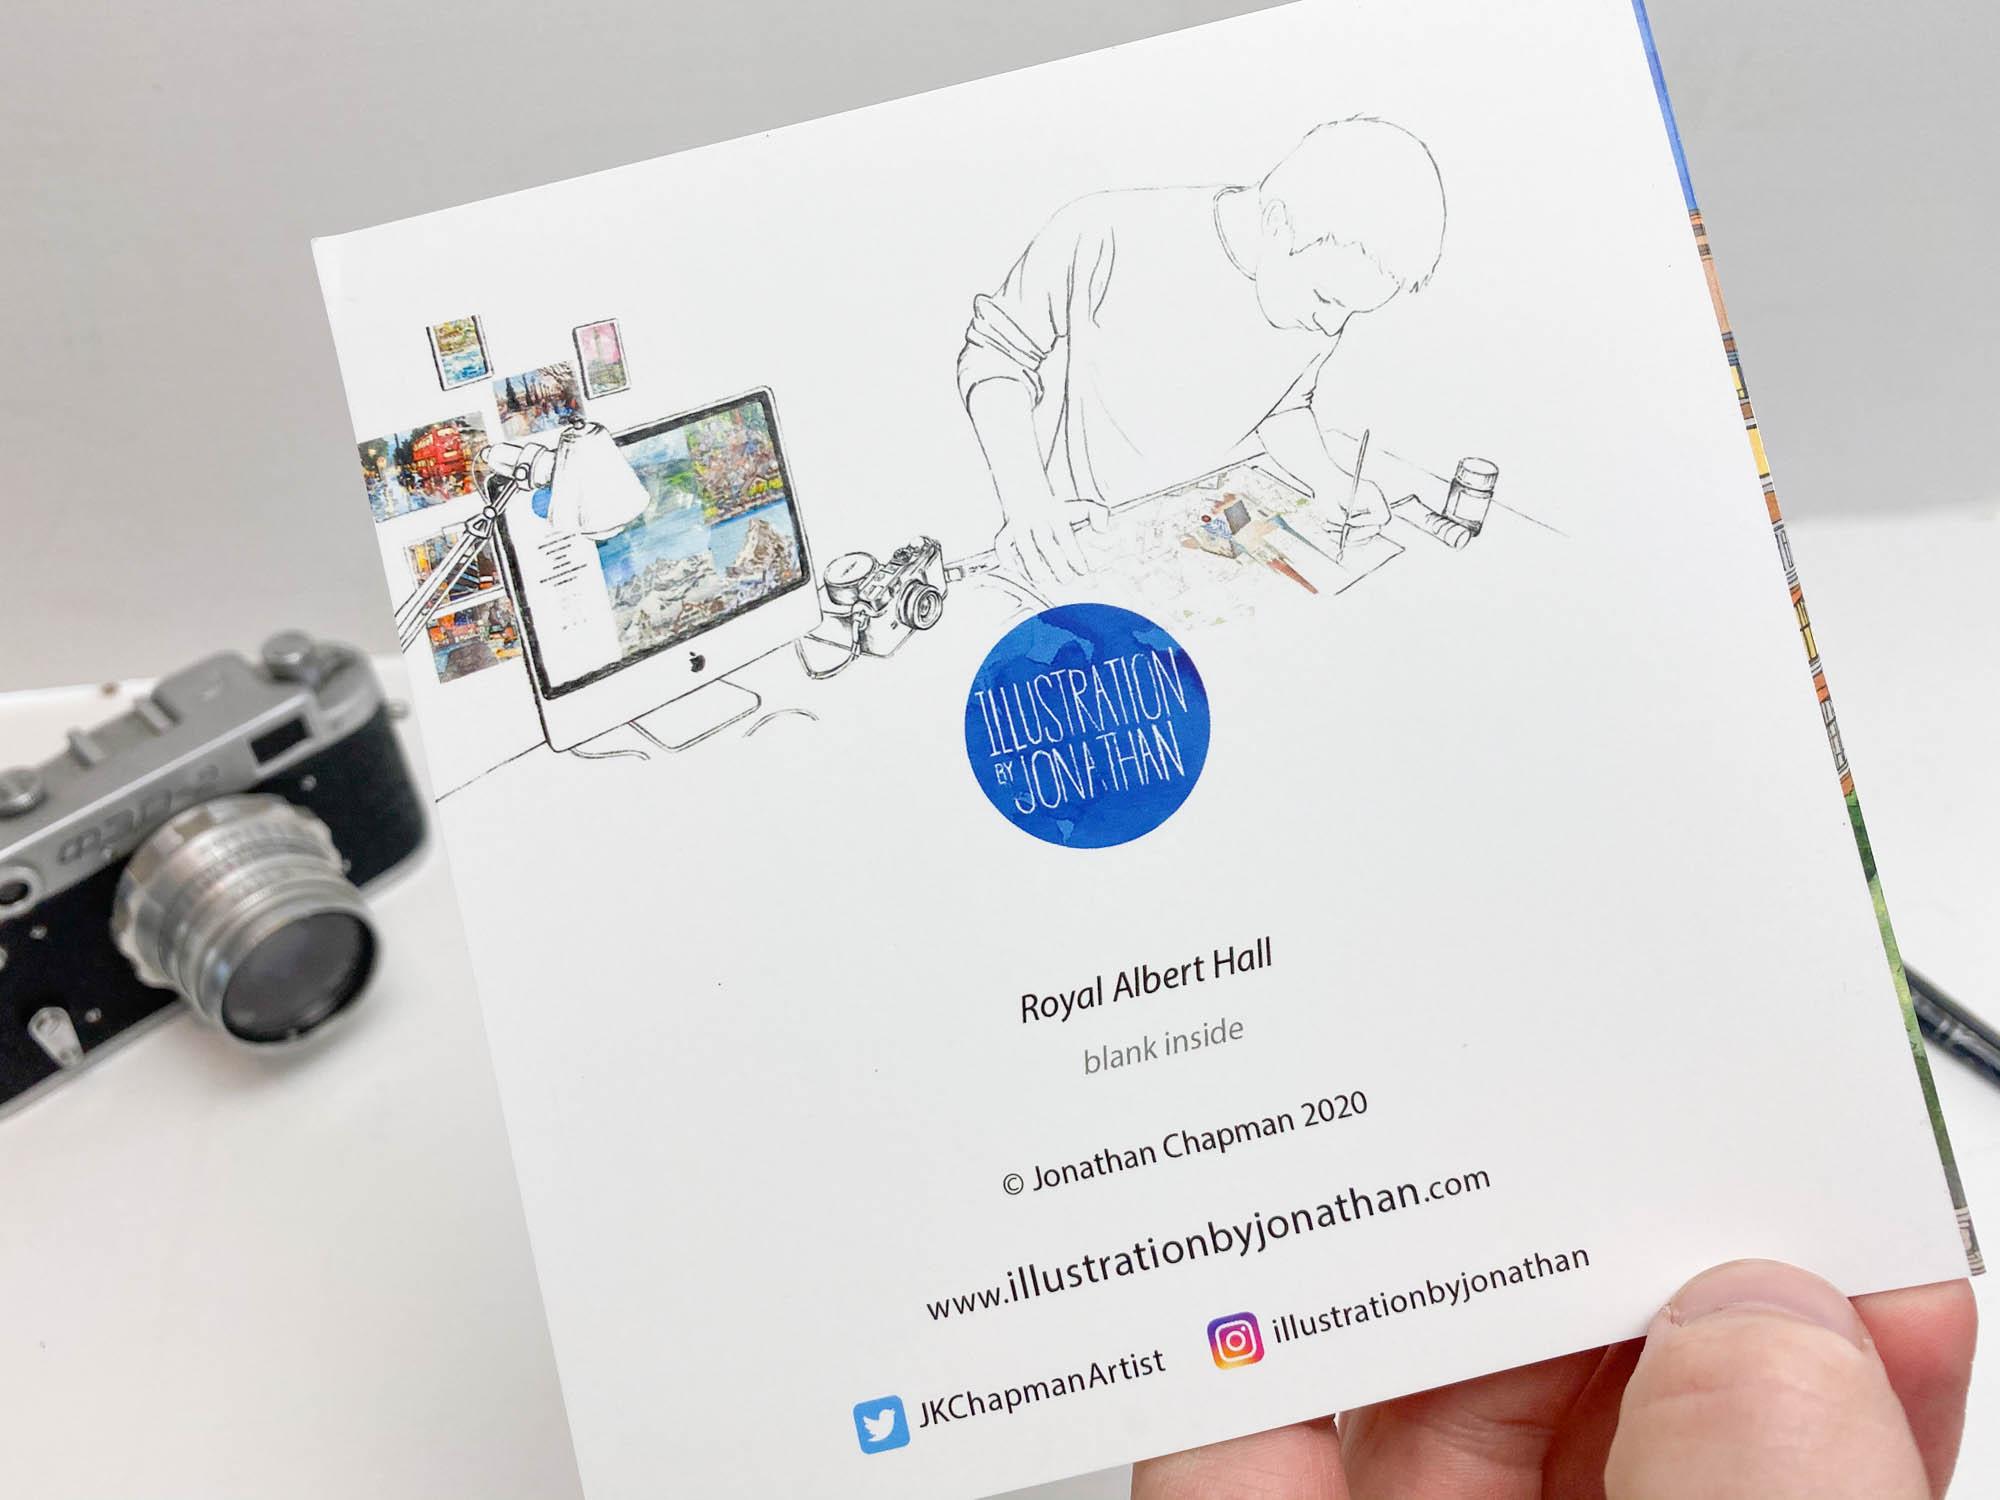 Royal Albert Hall Greeting Card - Illustration by Jonathan Chapman